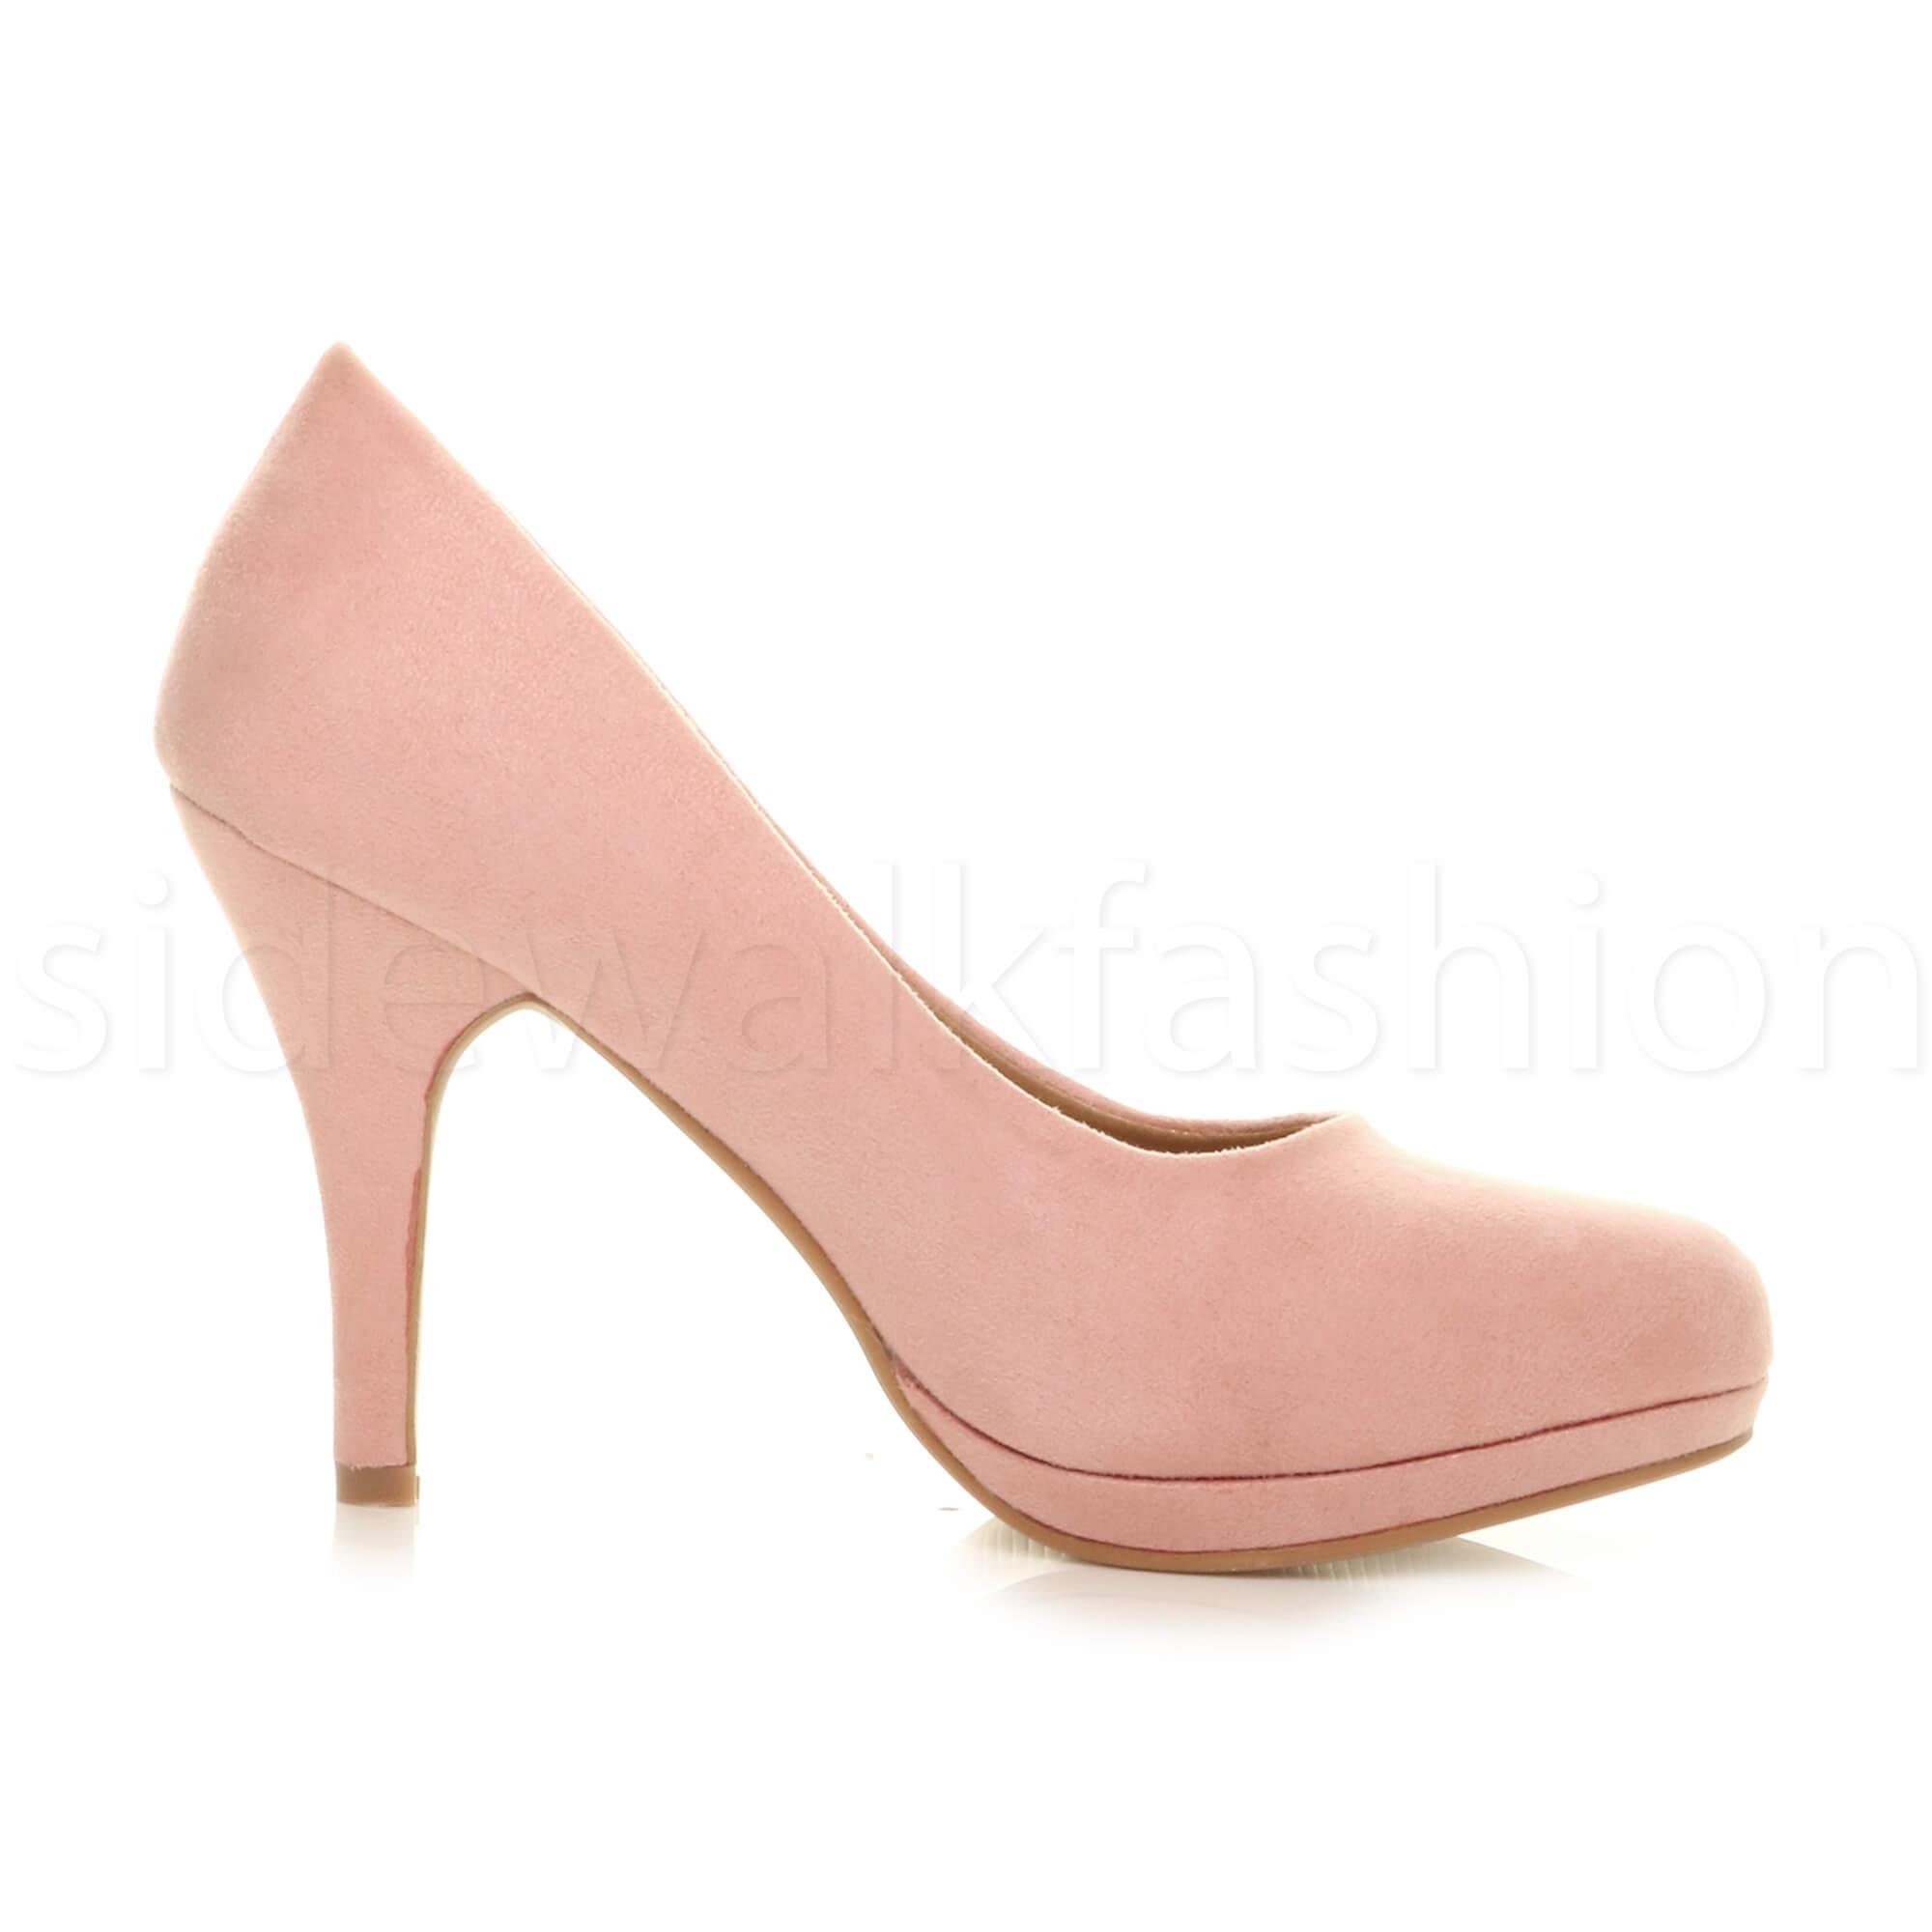 Womens-ladies-high-mid-heel-platform-wedding-evening-bridesmaid-court-shoes-size thumbnail 4